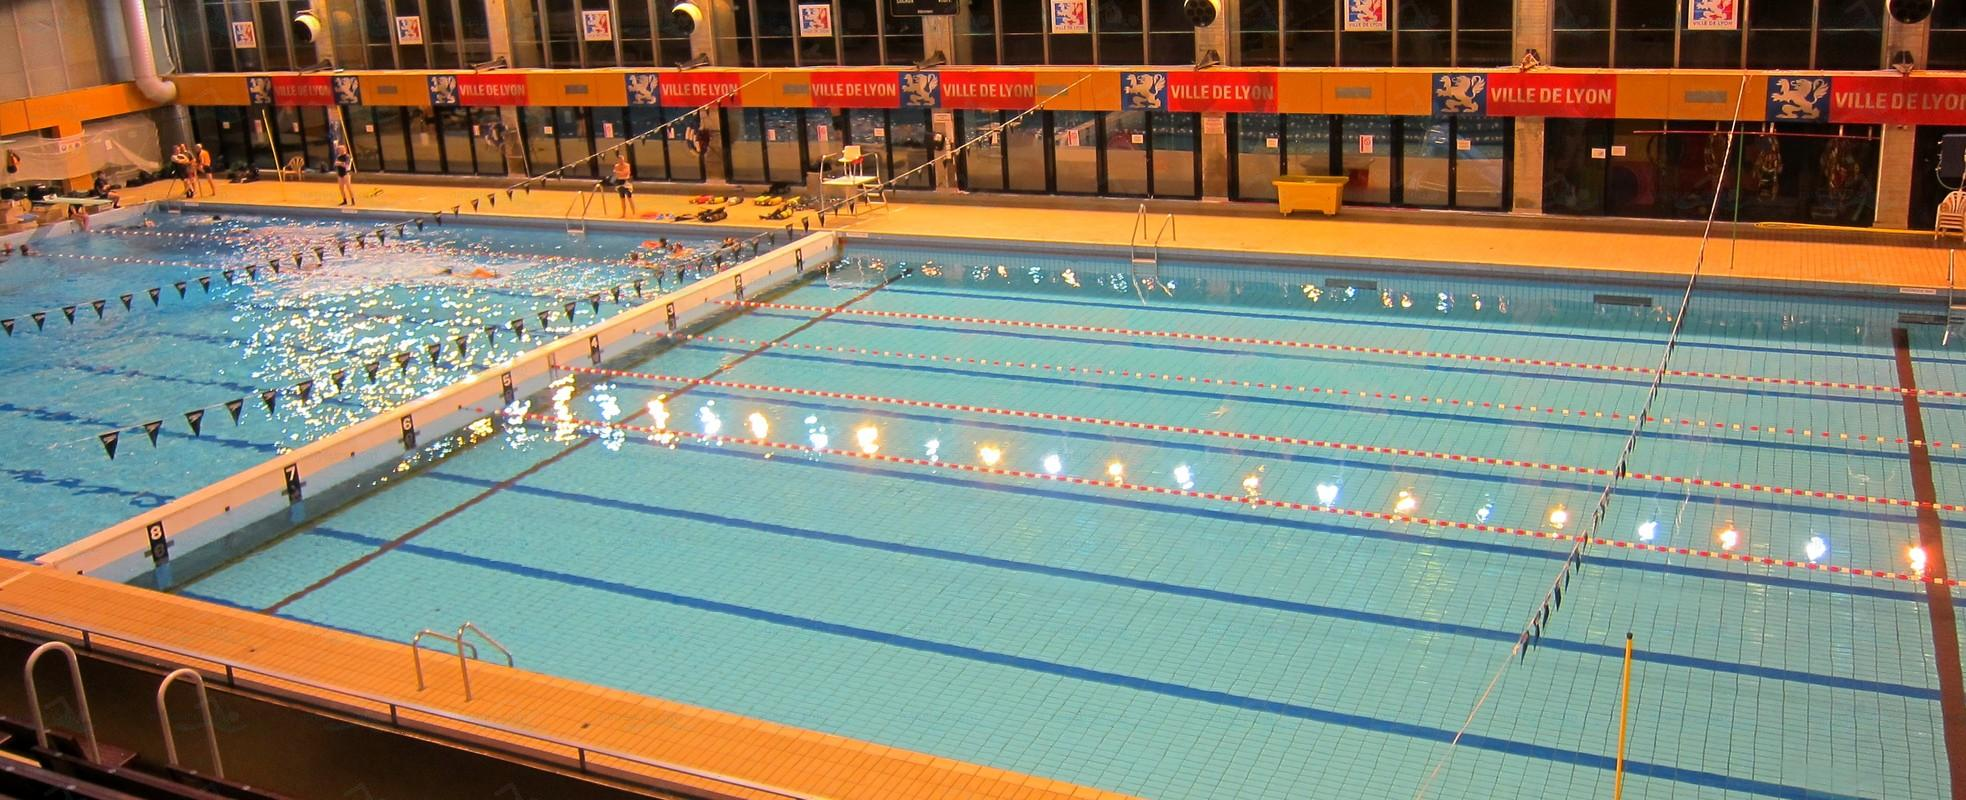 Photos piscine de vaise - Piscine municipale cabourg lyon ...